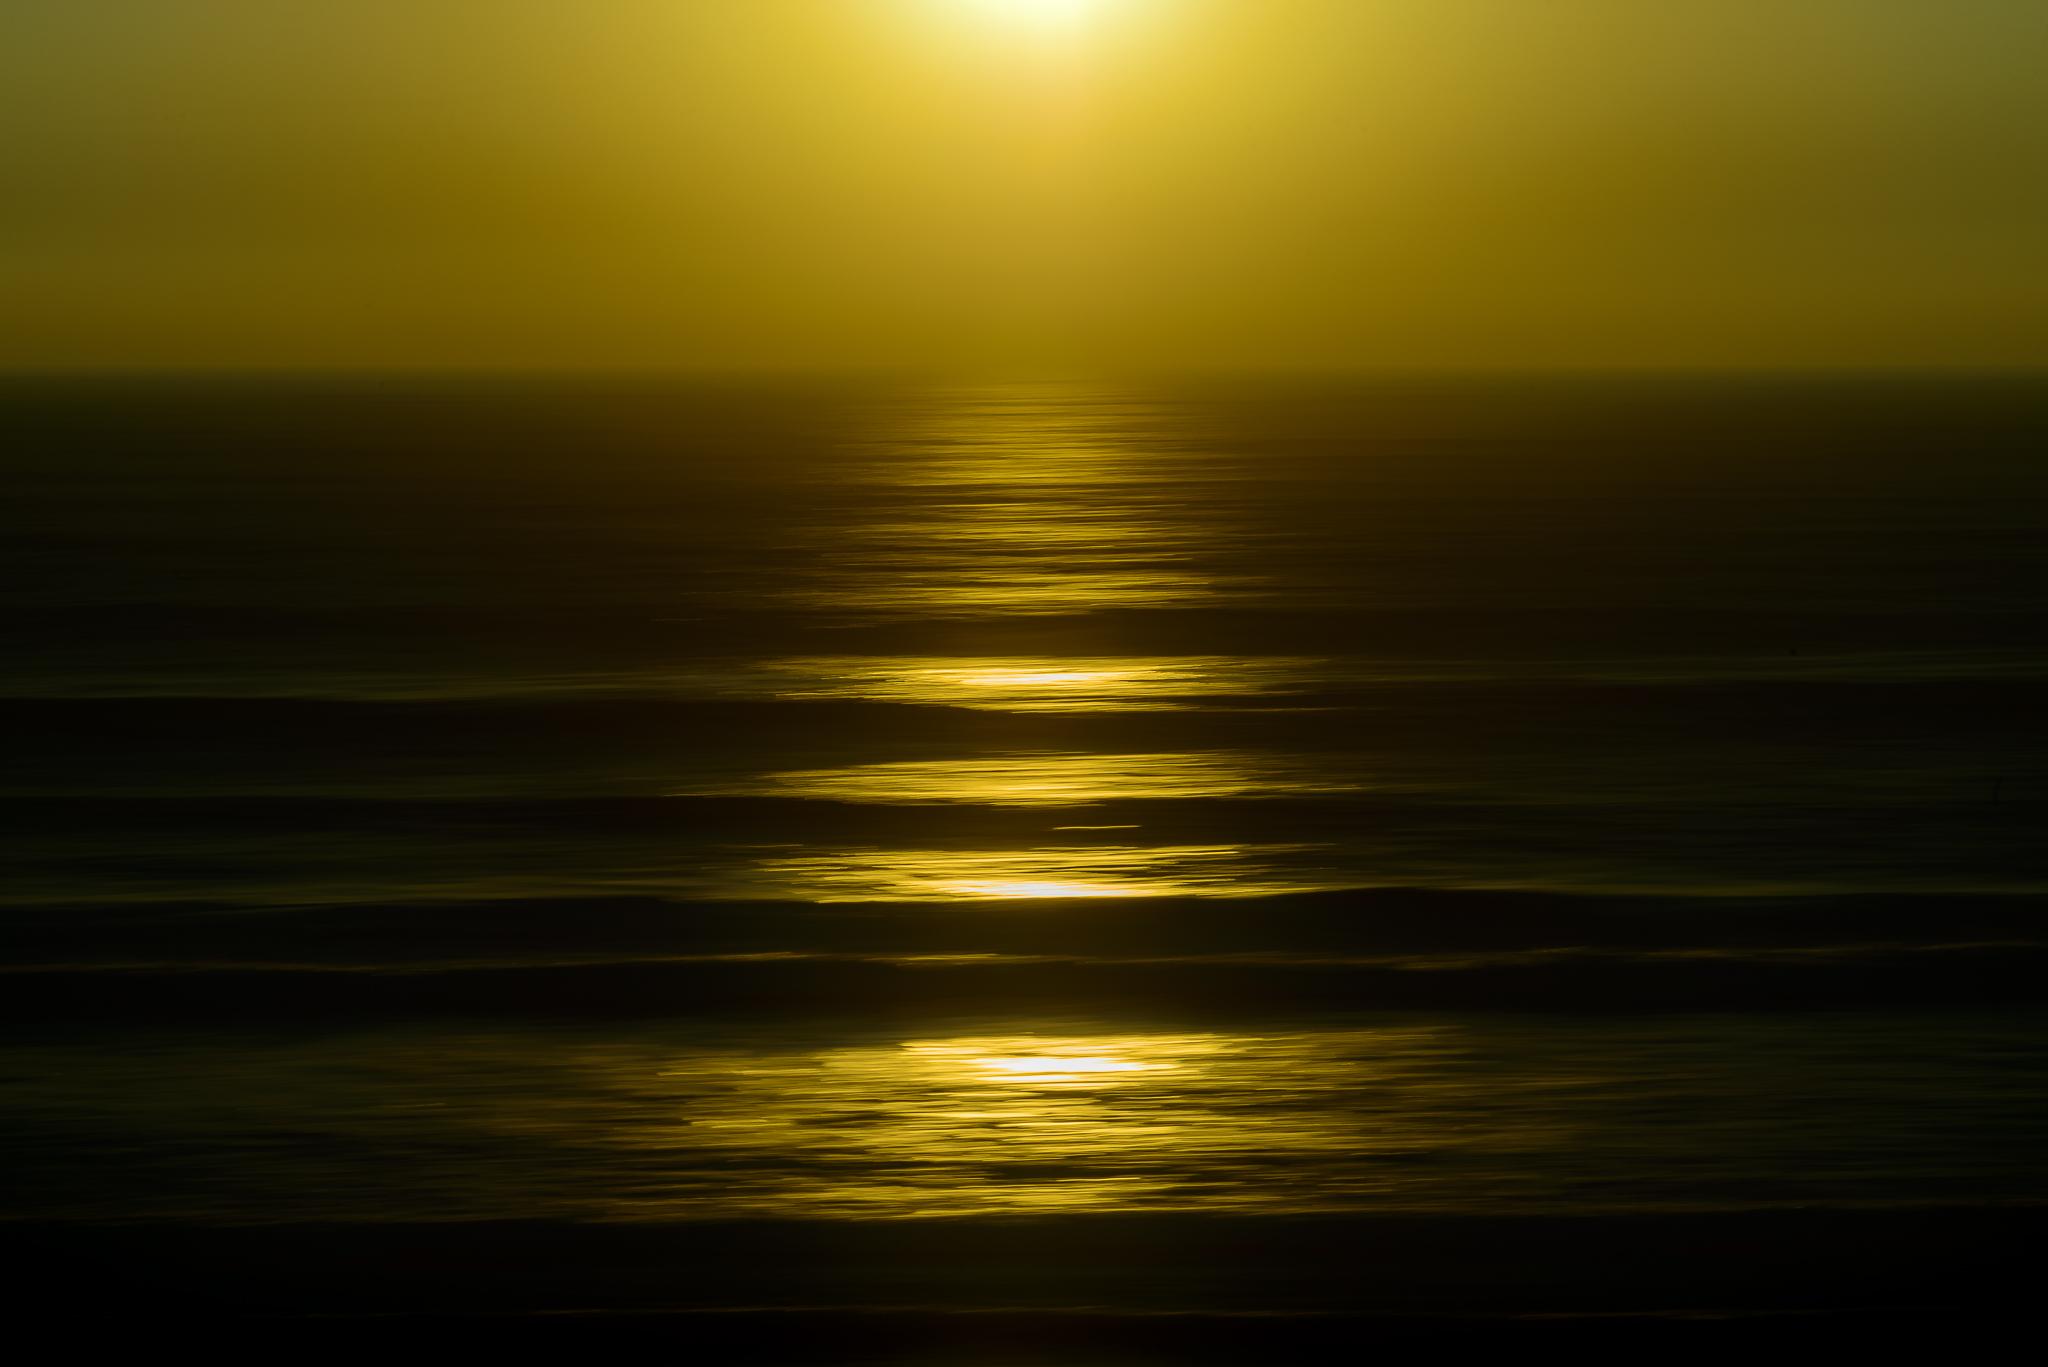 san_diego_law_street_sunset_shutter_drag